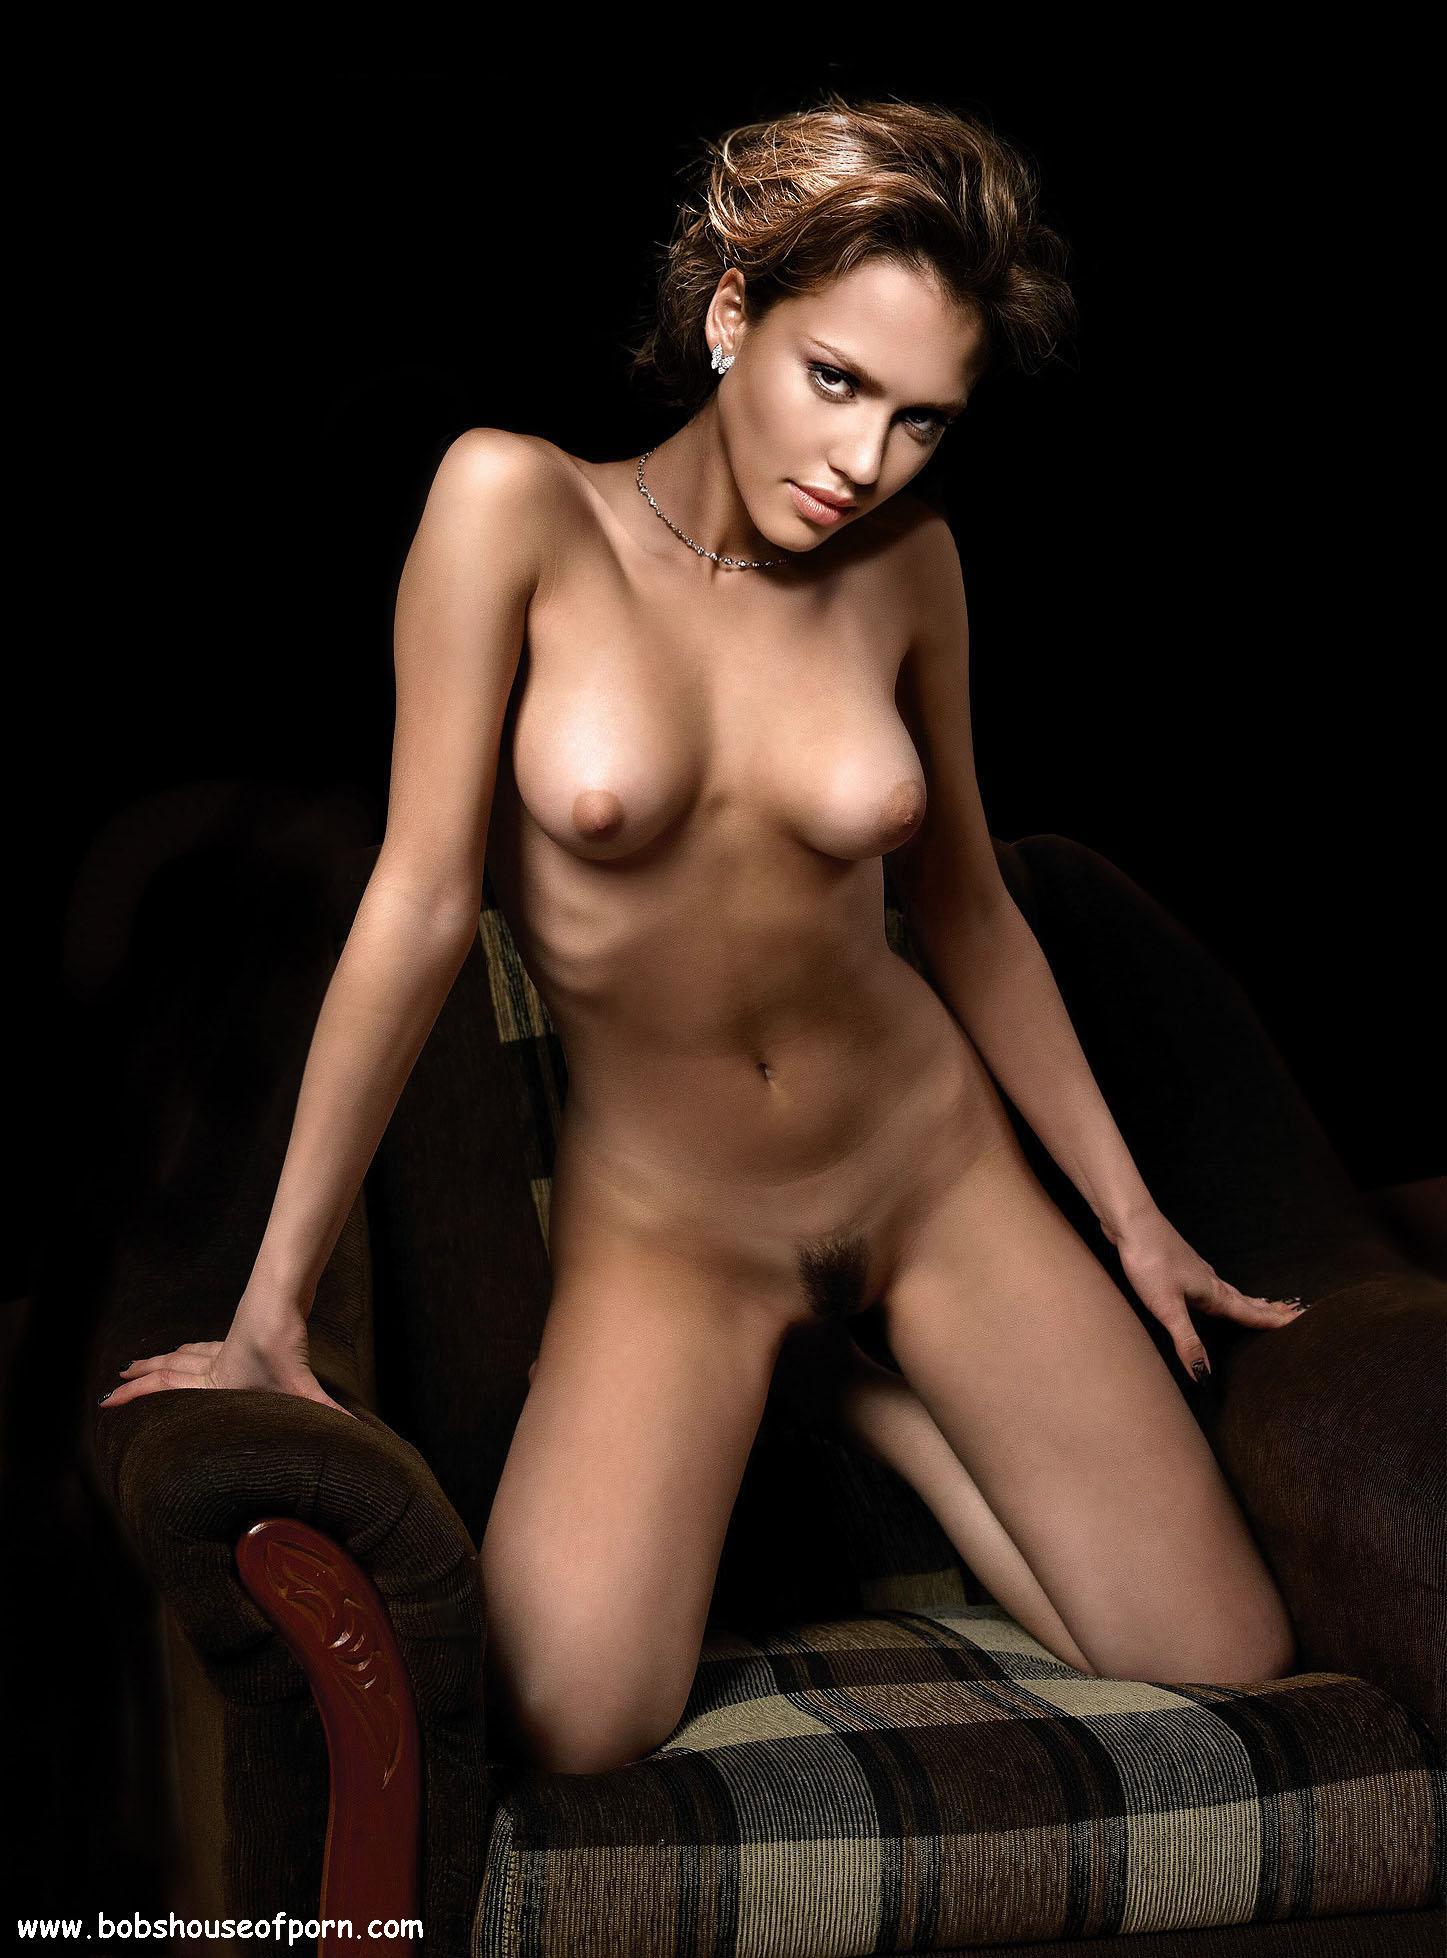 Jessica alba hot videos and